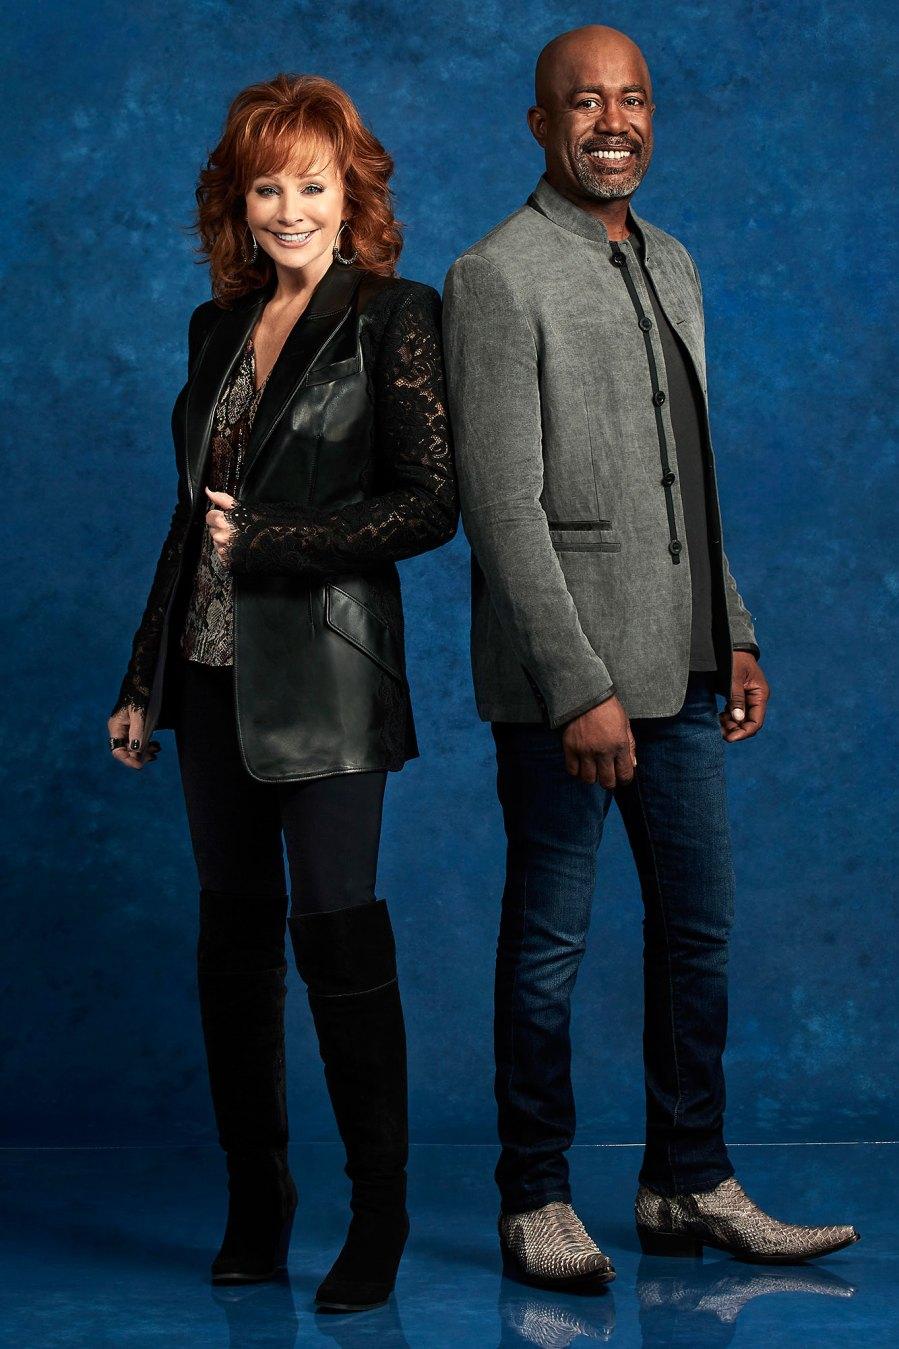 Who Is Hosting Reba McEntire and Darius Rucker CMA Awards 2020